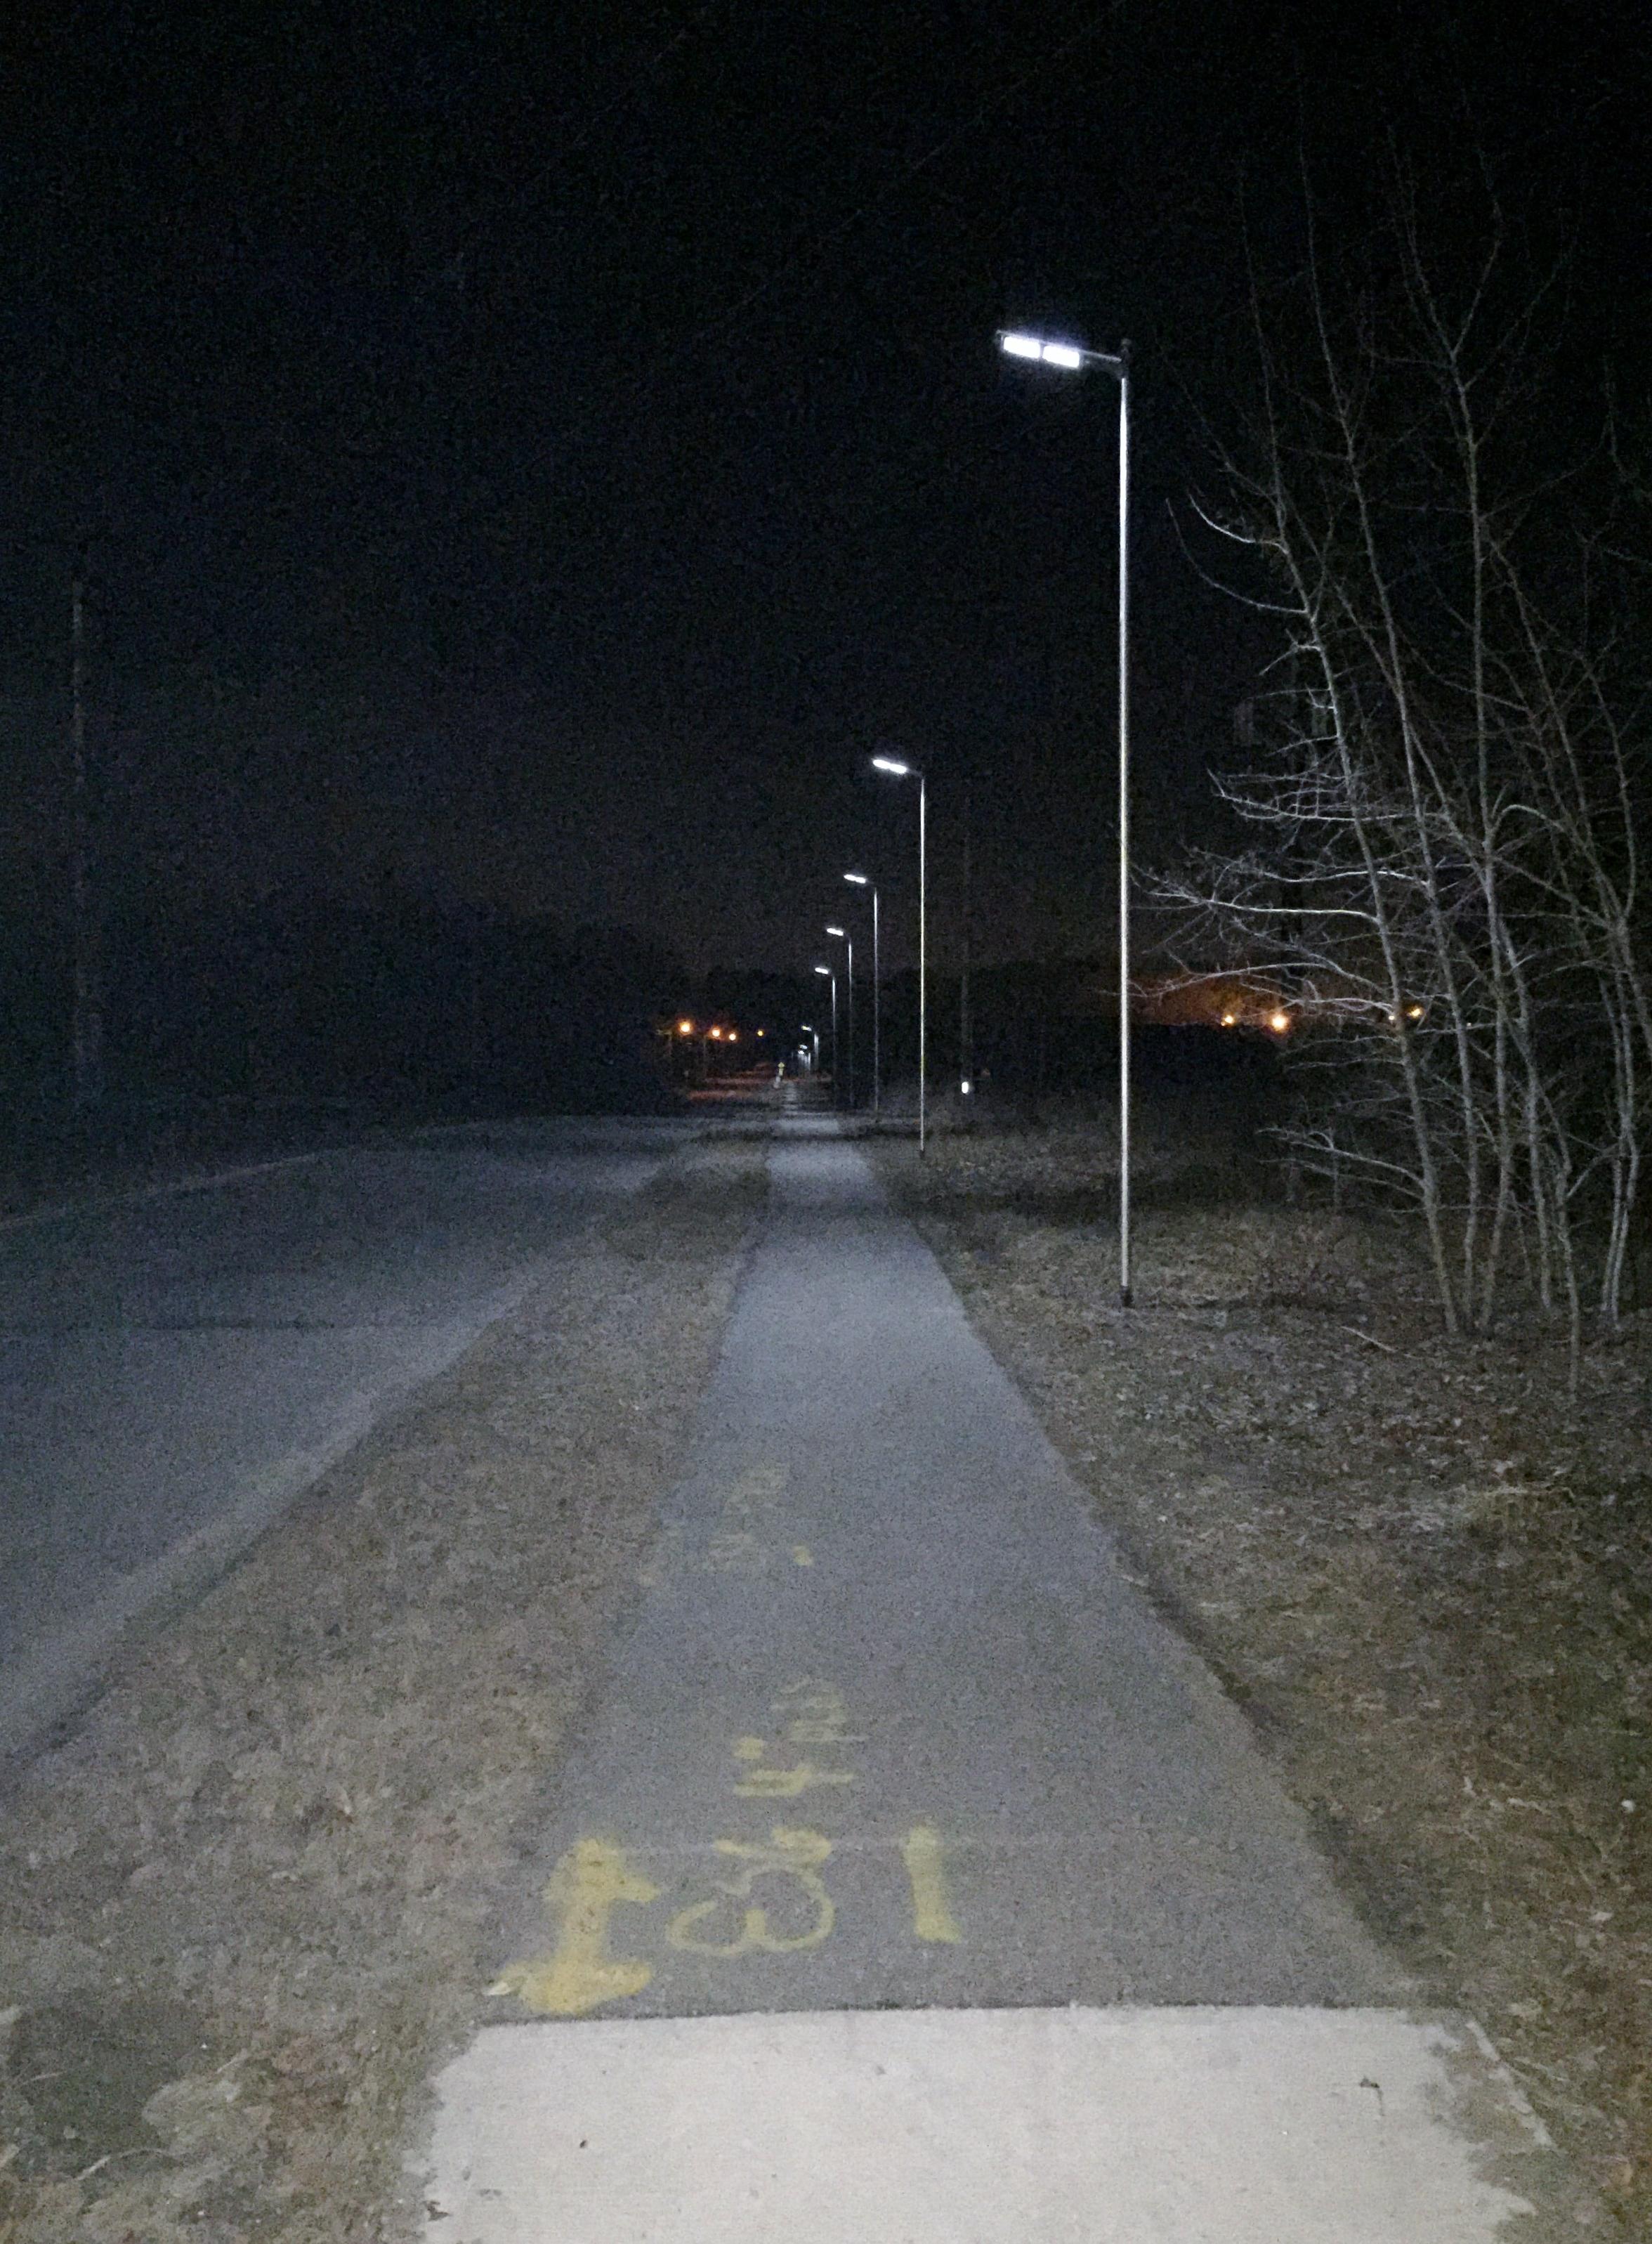 Smith Valve Solar Ed Sidewalk Lights Looking Toward The Mbta Station